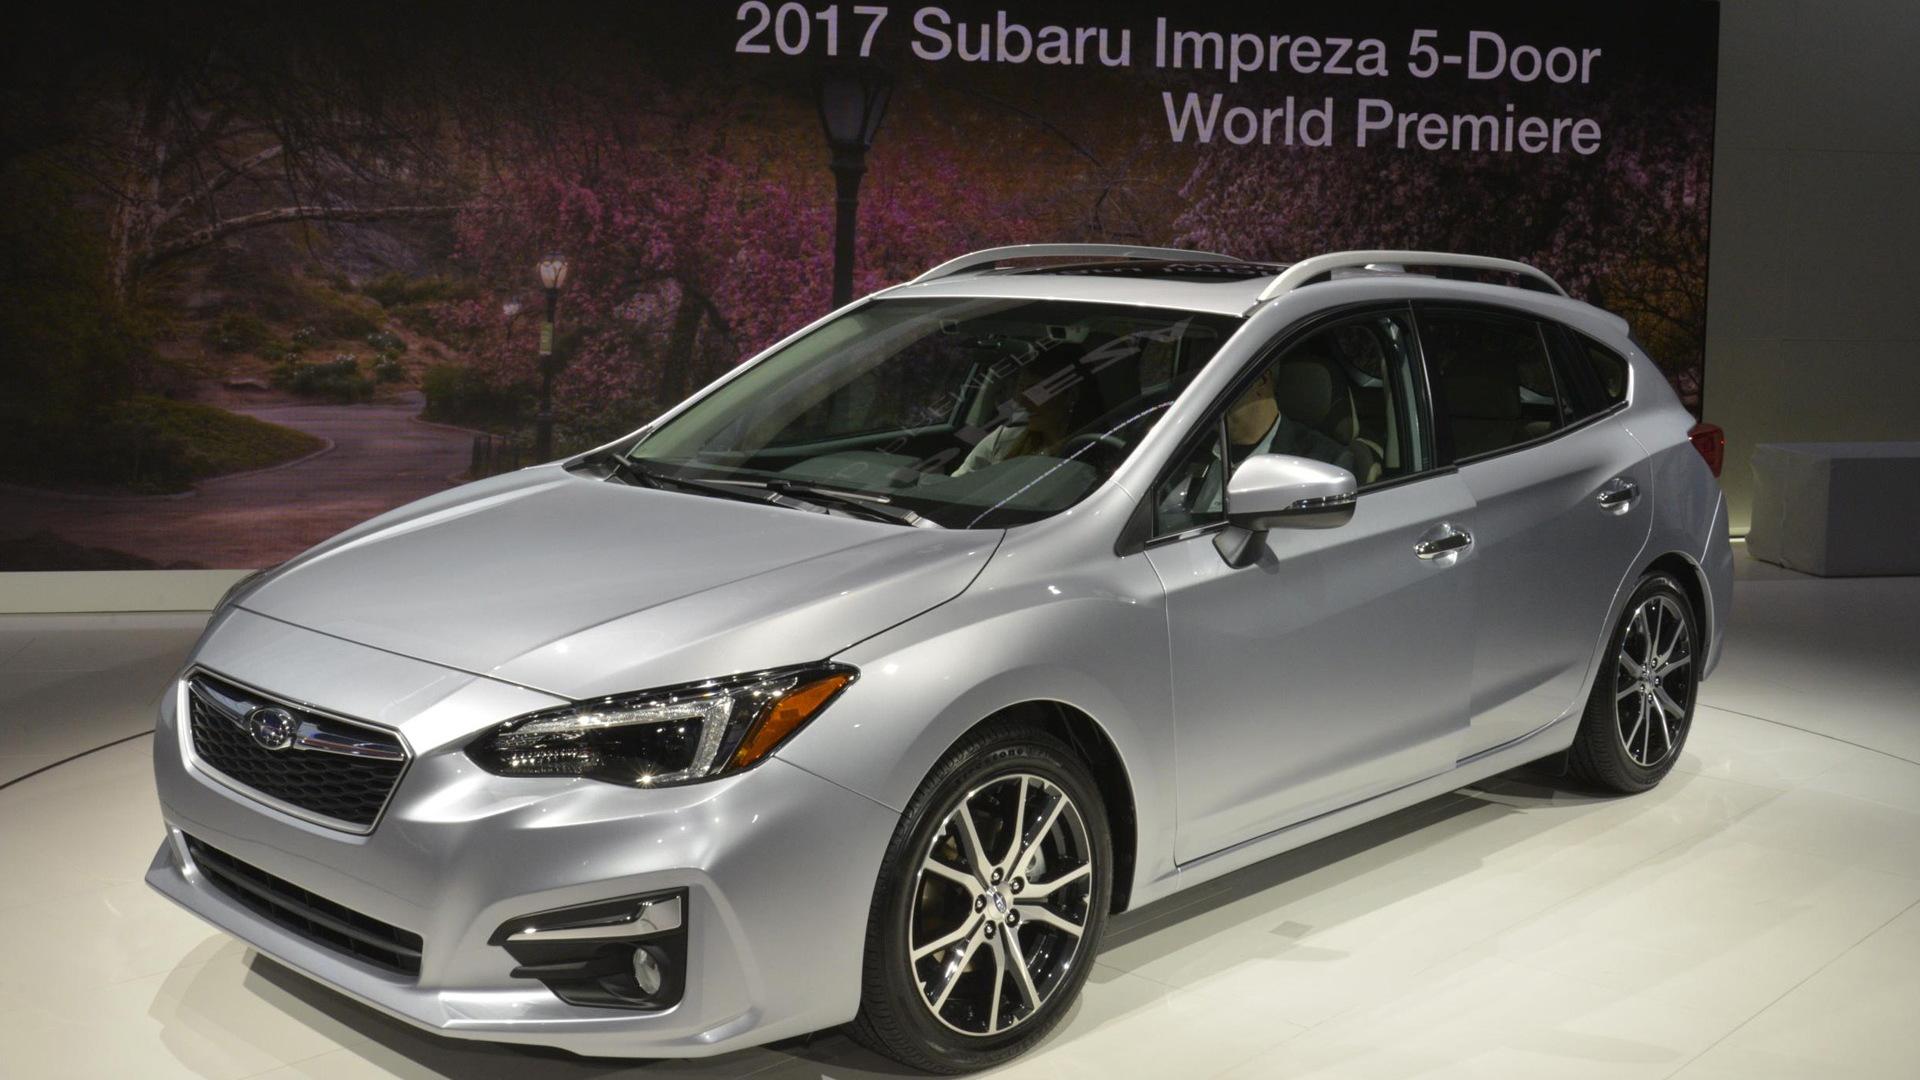 2017 Subaru Impreza 5-Door, 2016 New York Auto Show